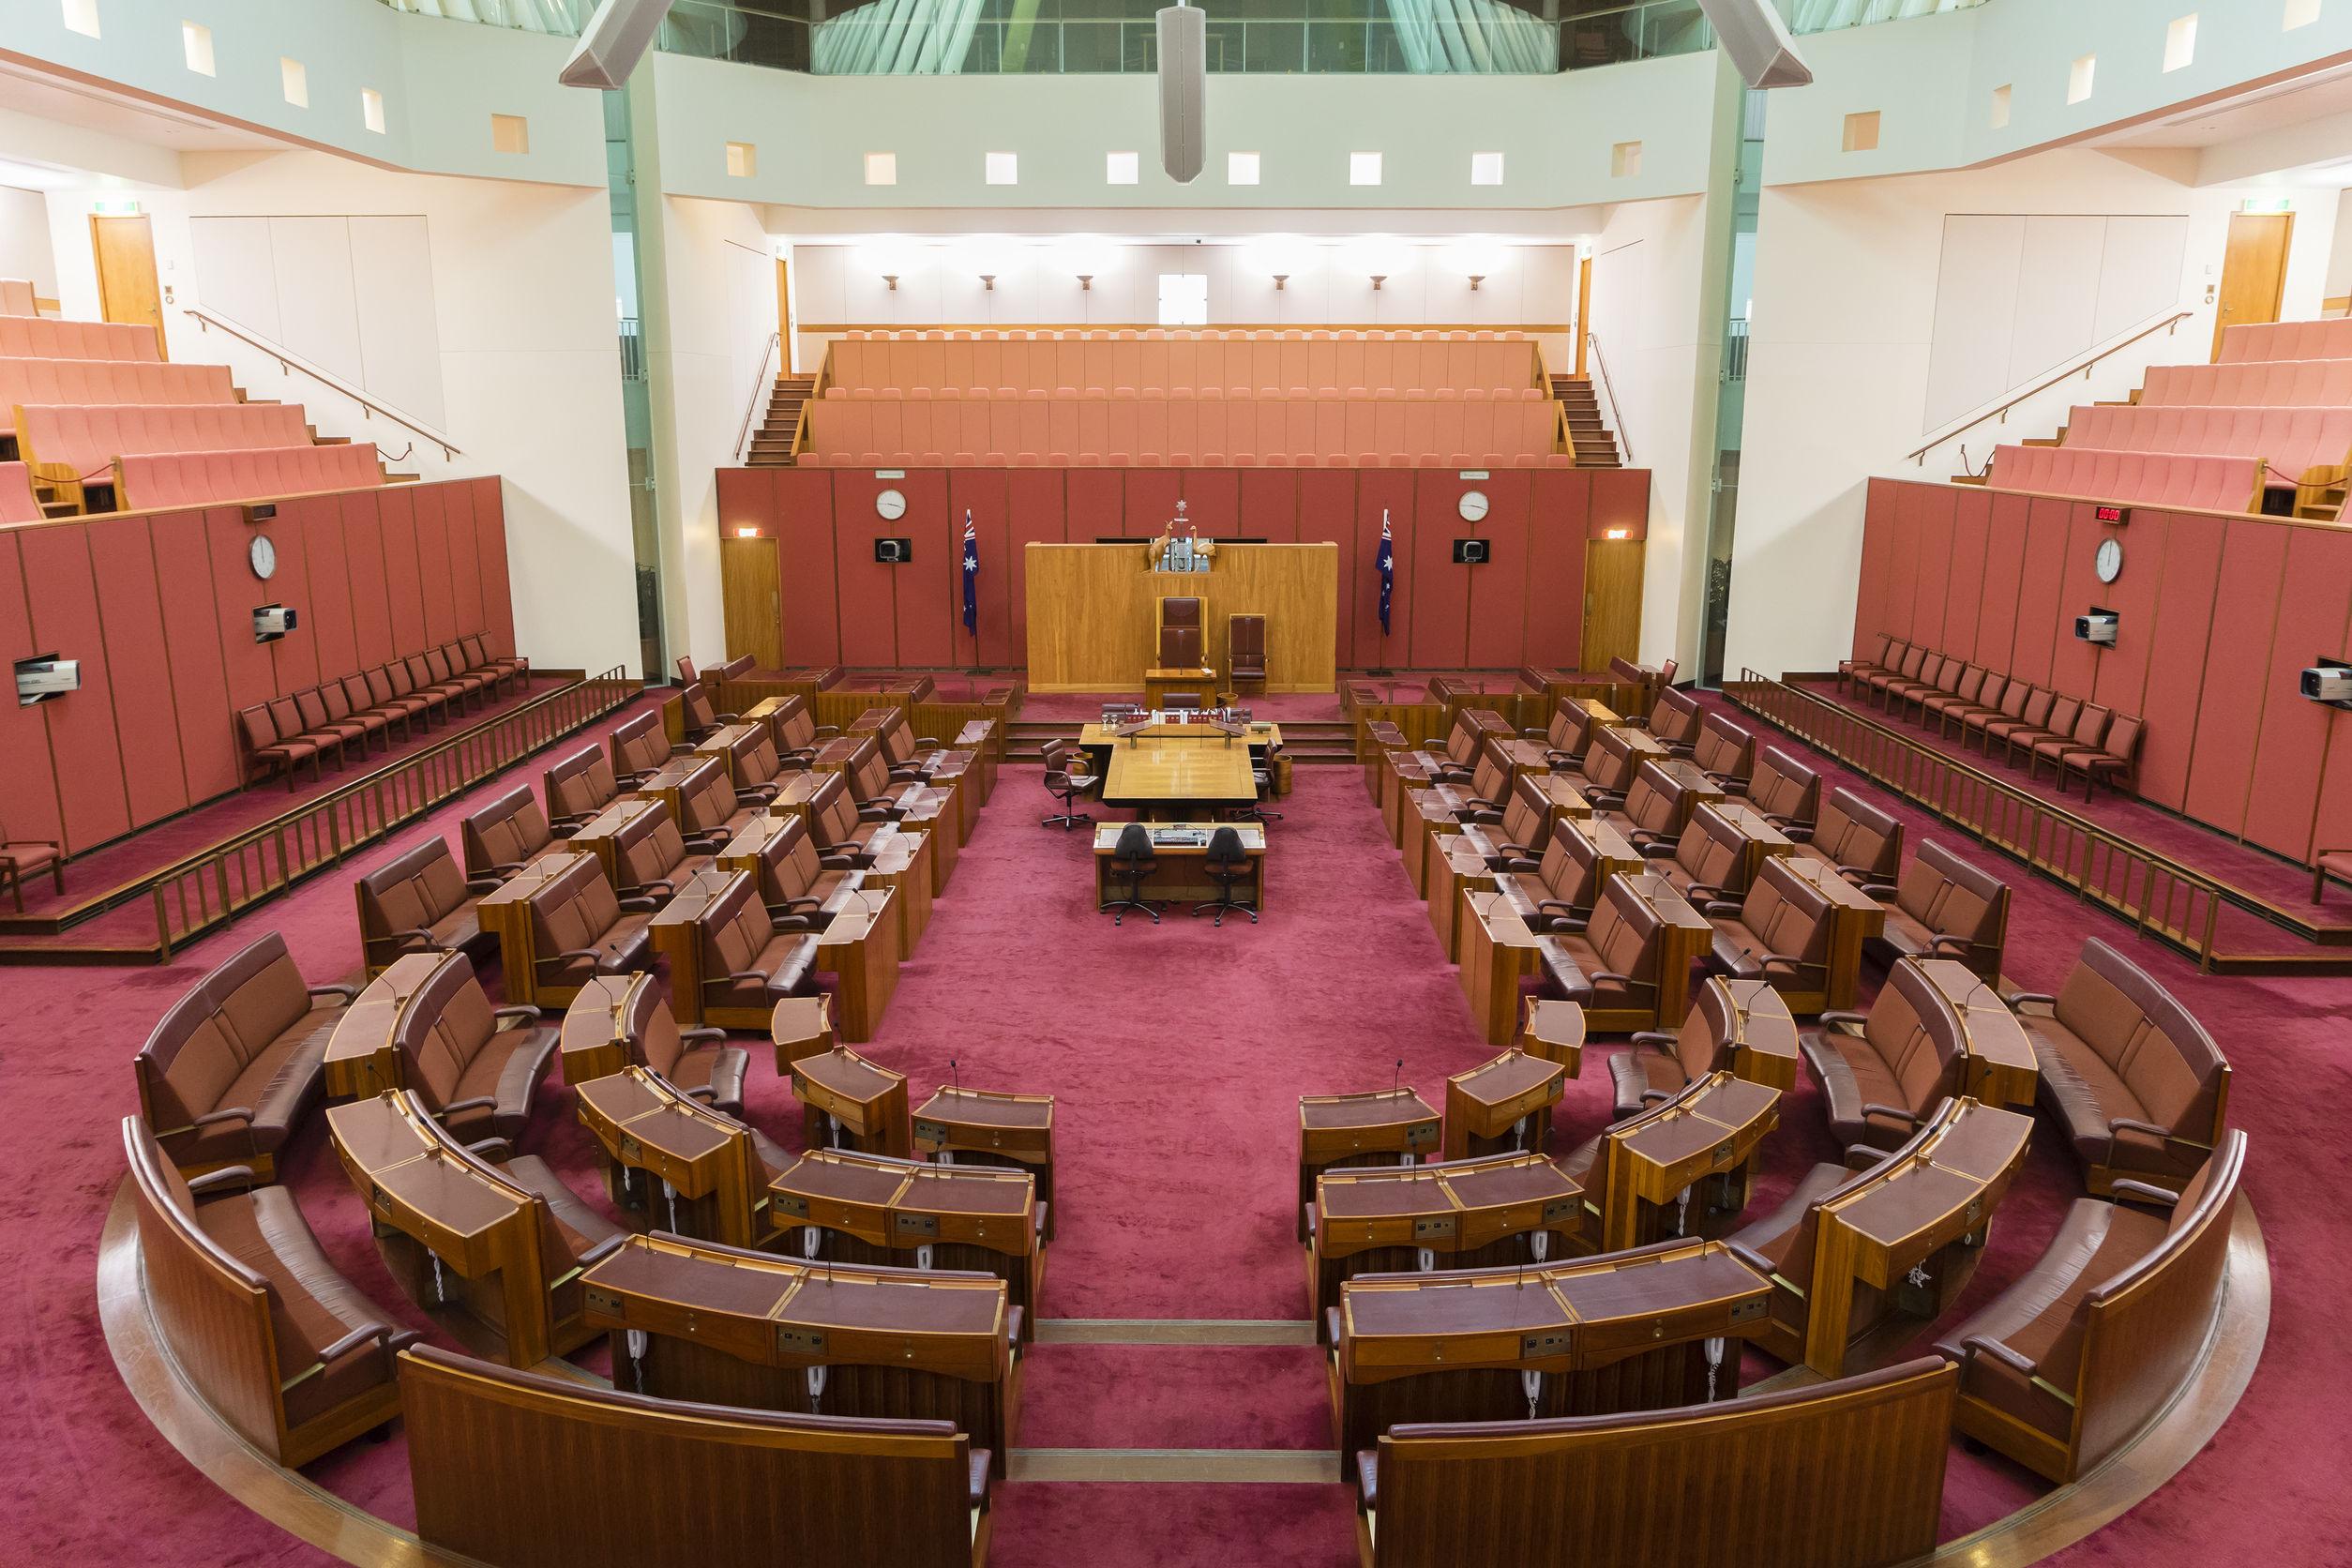 Kristina Keneally still undecided about her Senate bid